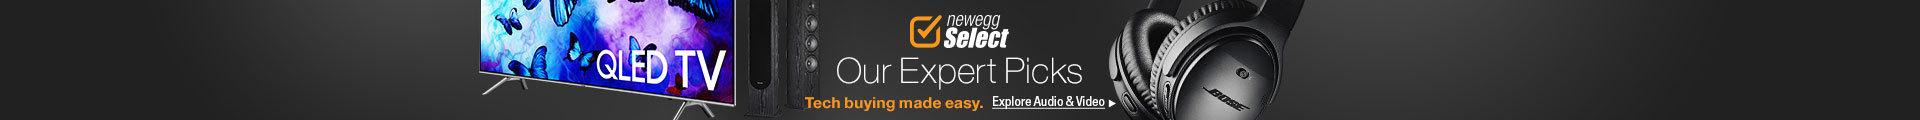 Our Expert Picks